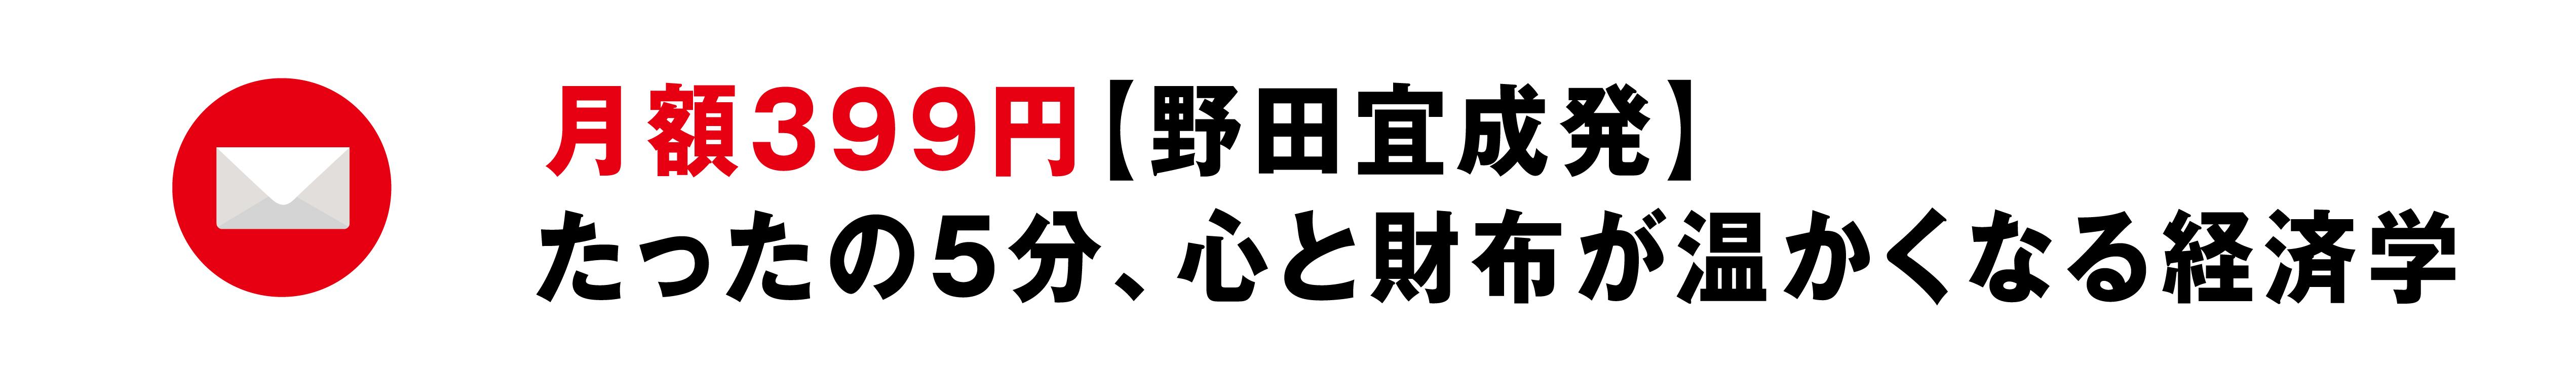 _blog_ハ?ナー 2-04.jpg